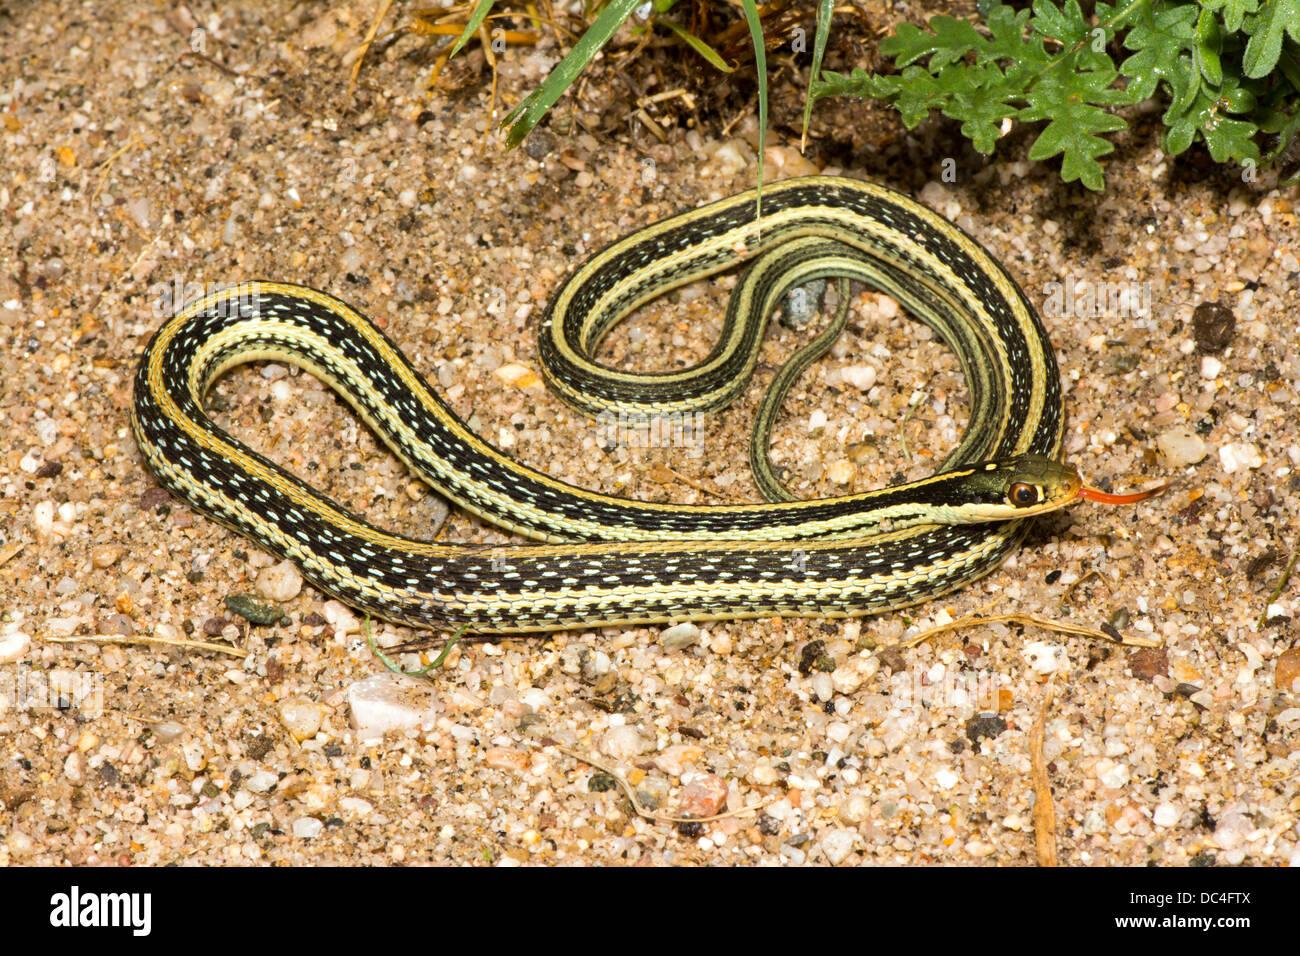 Western Ribbon Snake Thamnophis proximus origine sconosciuta 21 luglio adulto Colubridae Immagini Stock